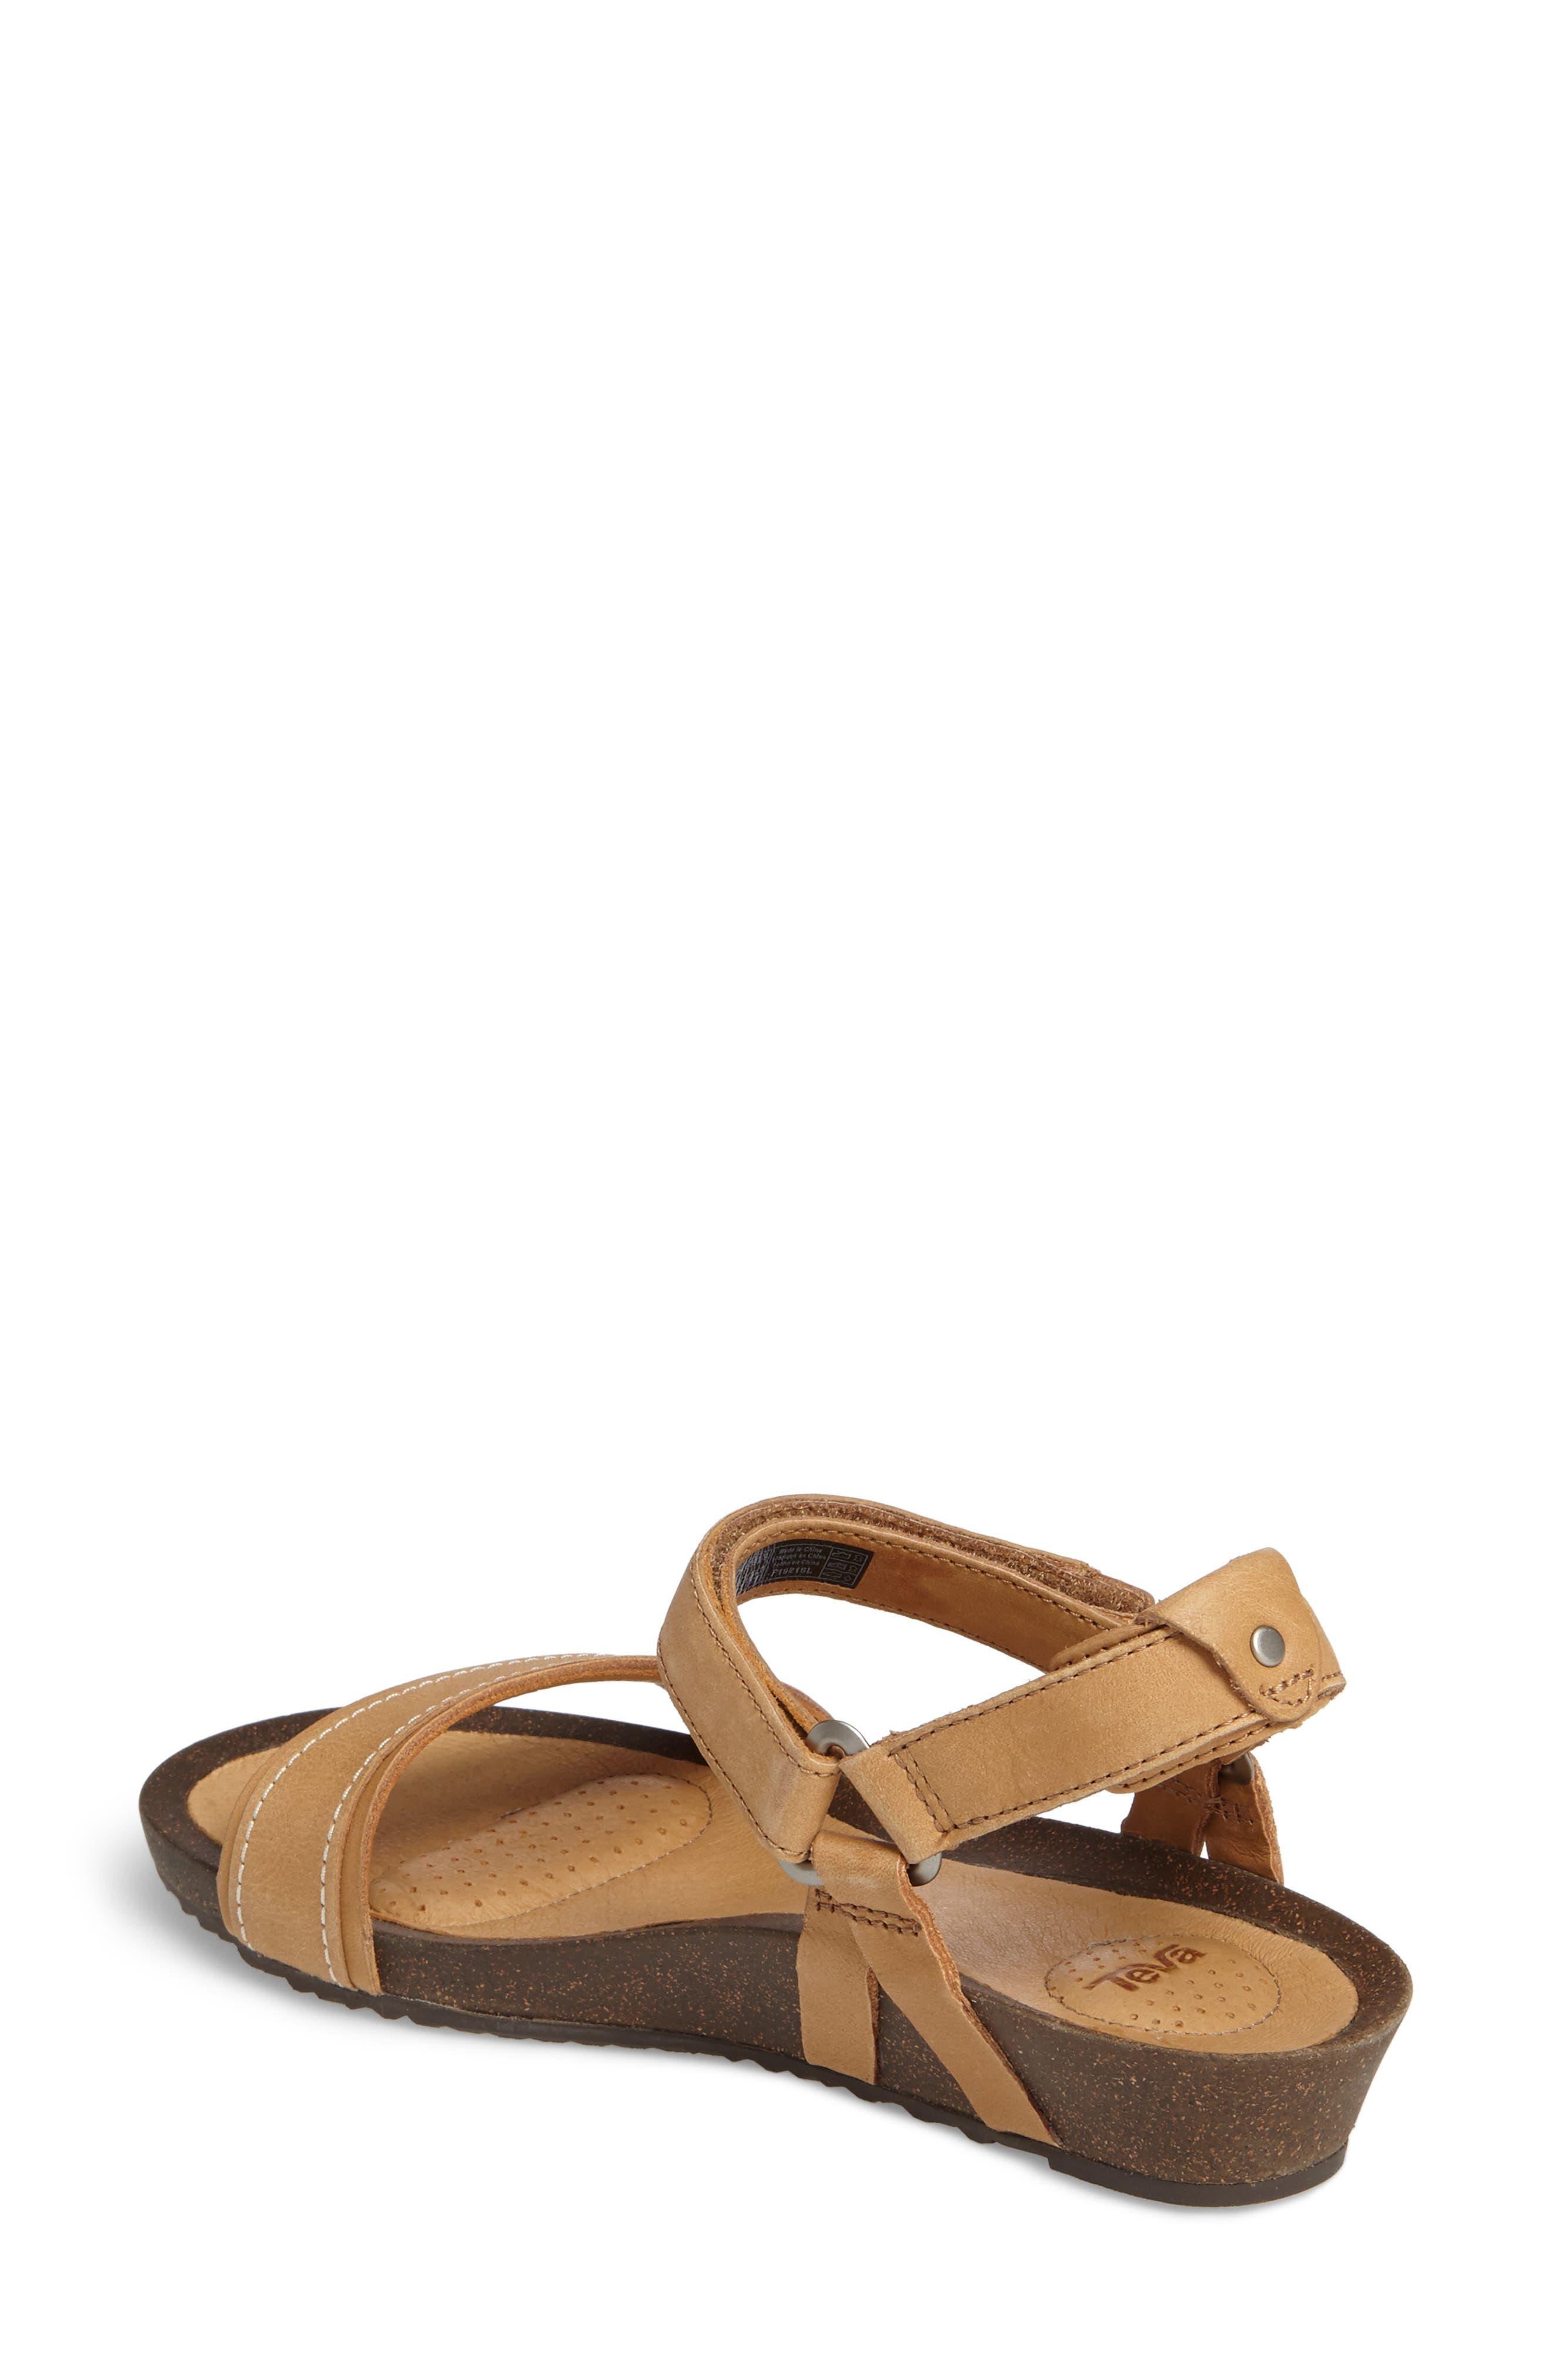 Ysidro Stitch Sandal,                             Alternate thumbnail 2, color,                             Tan Leather